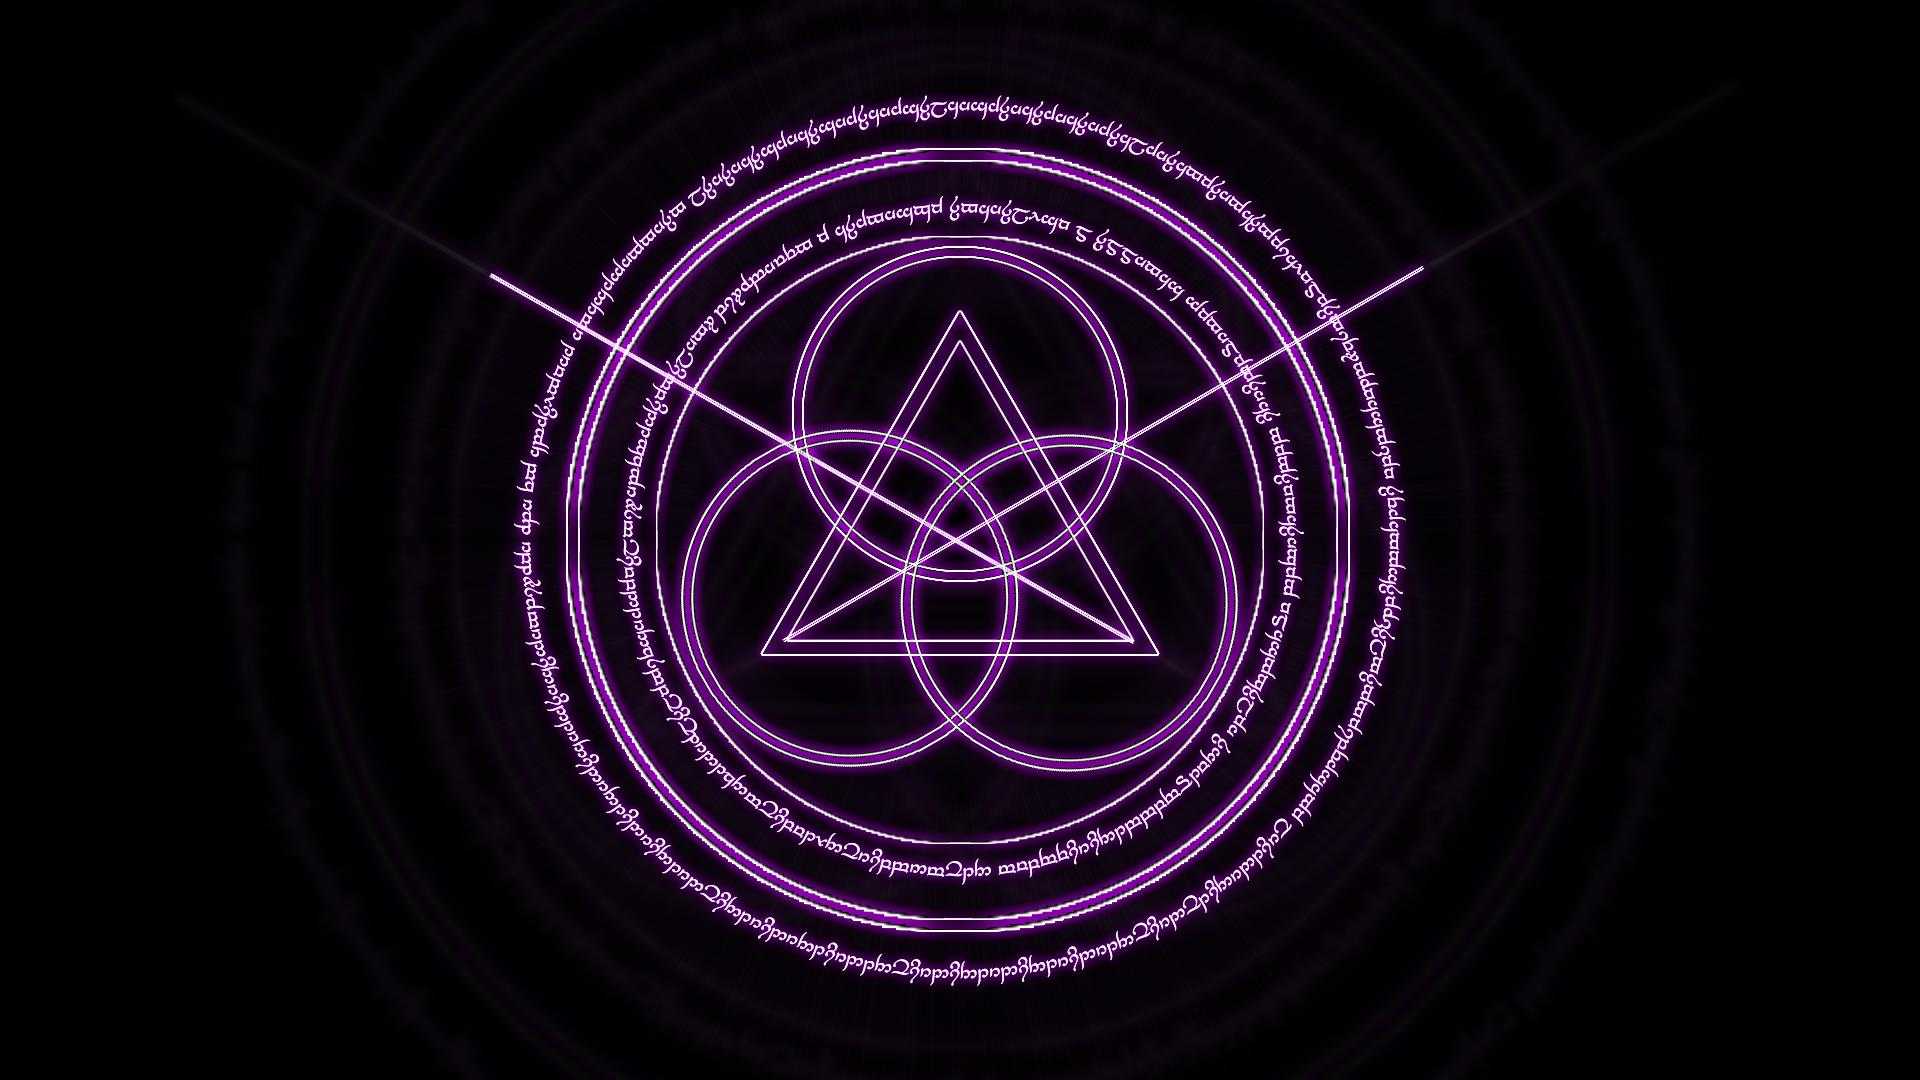 Occult Computer Wallpapers Desktop Backgrounds 1920x1080